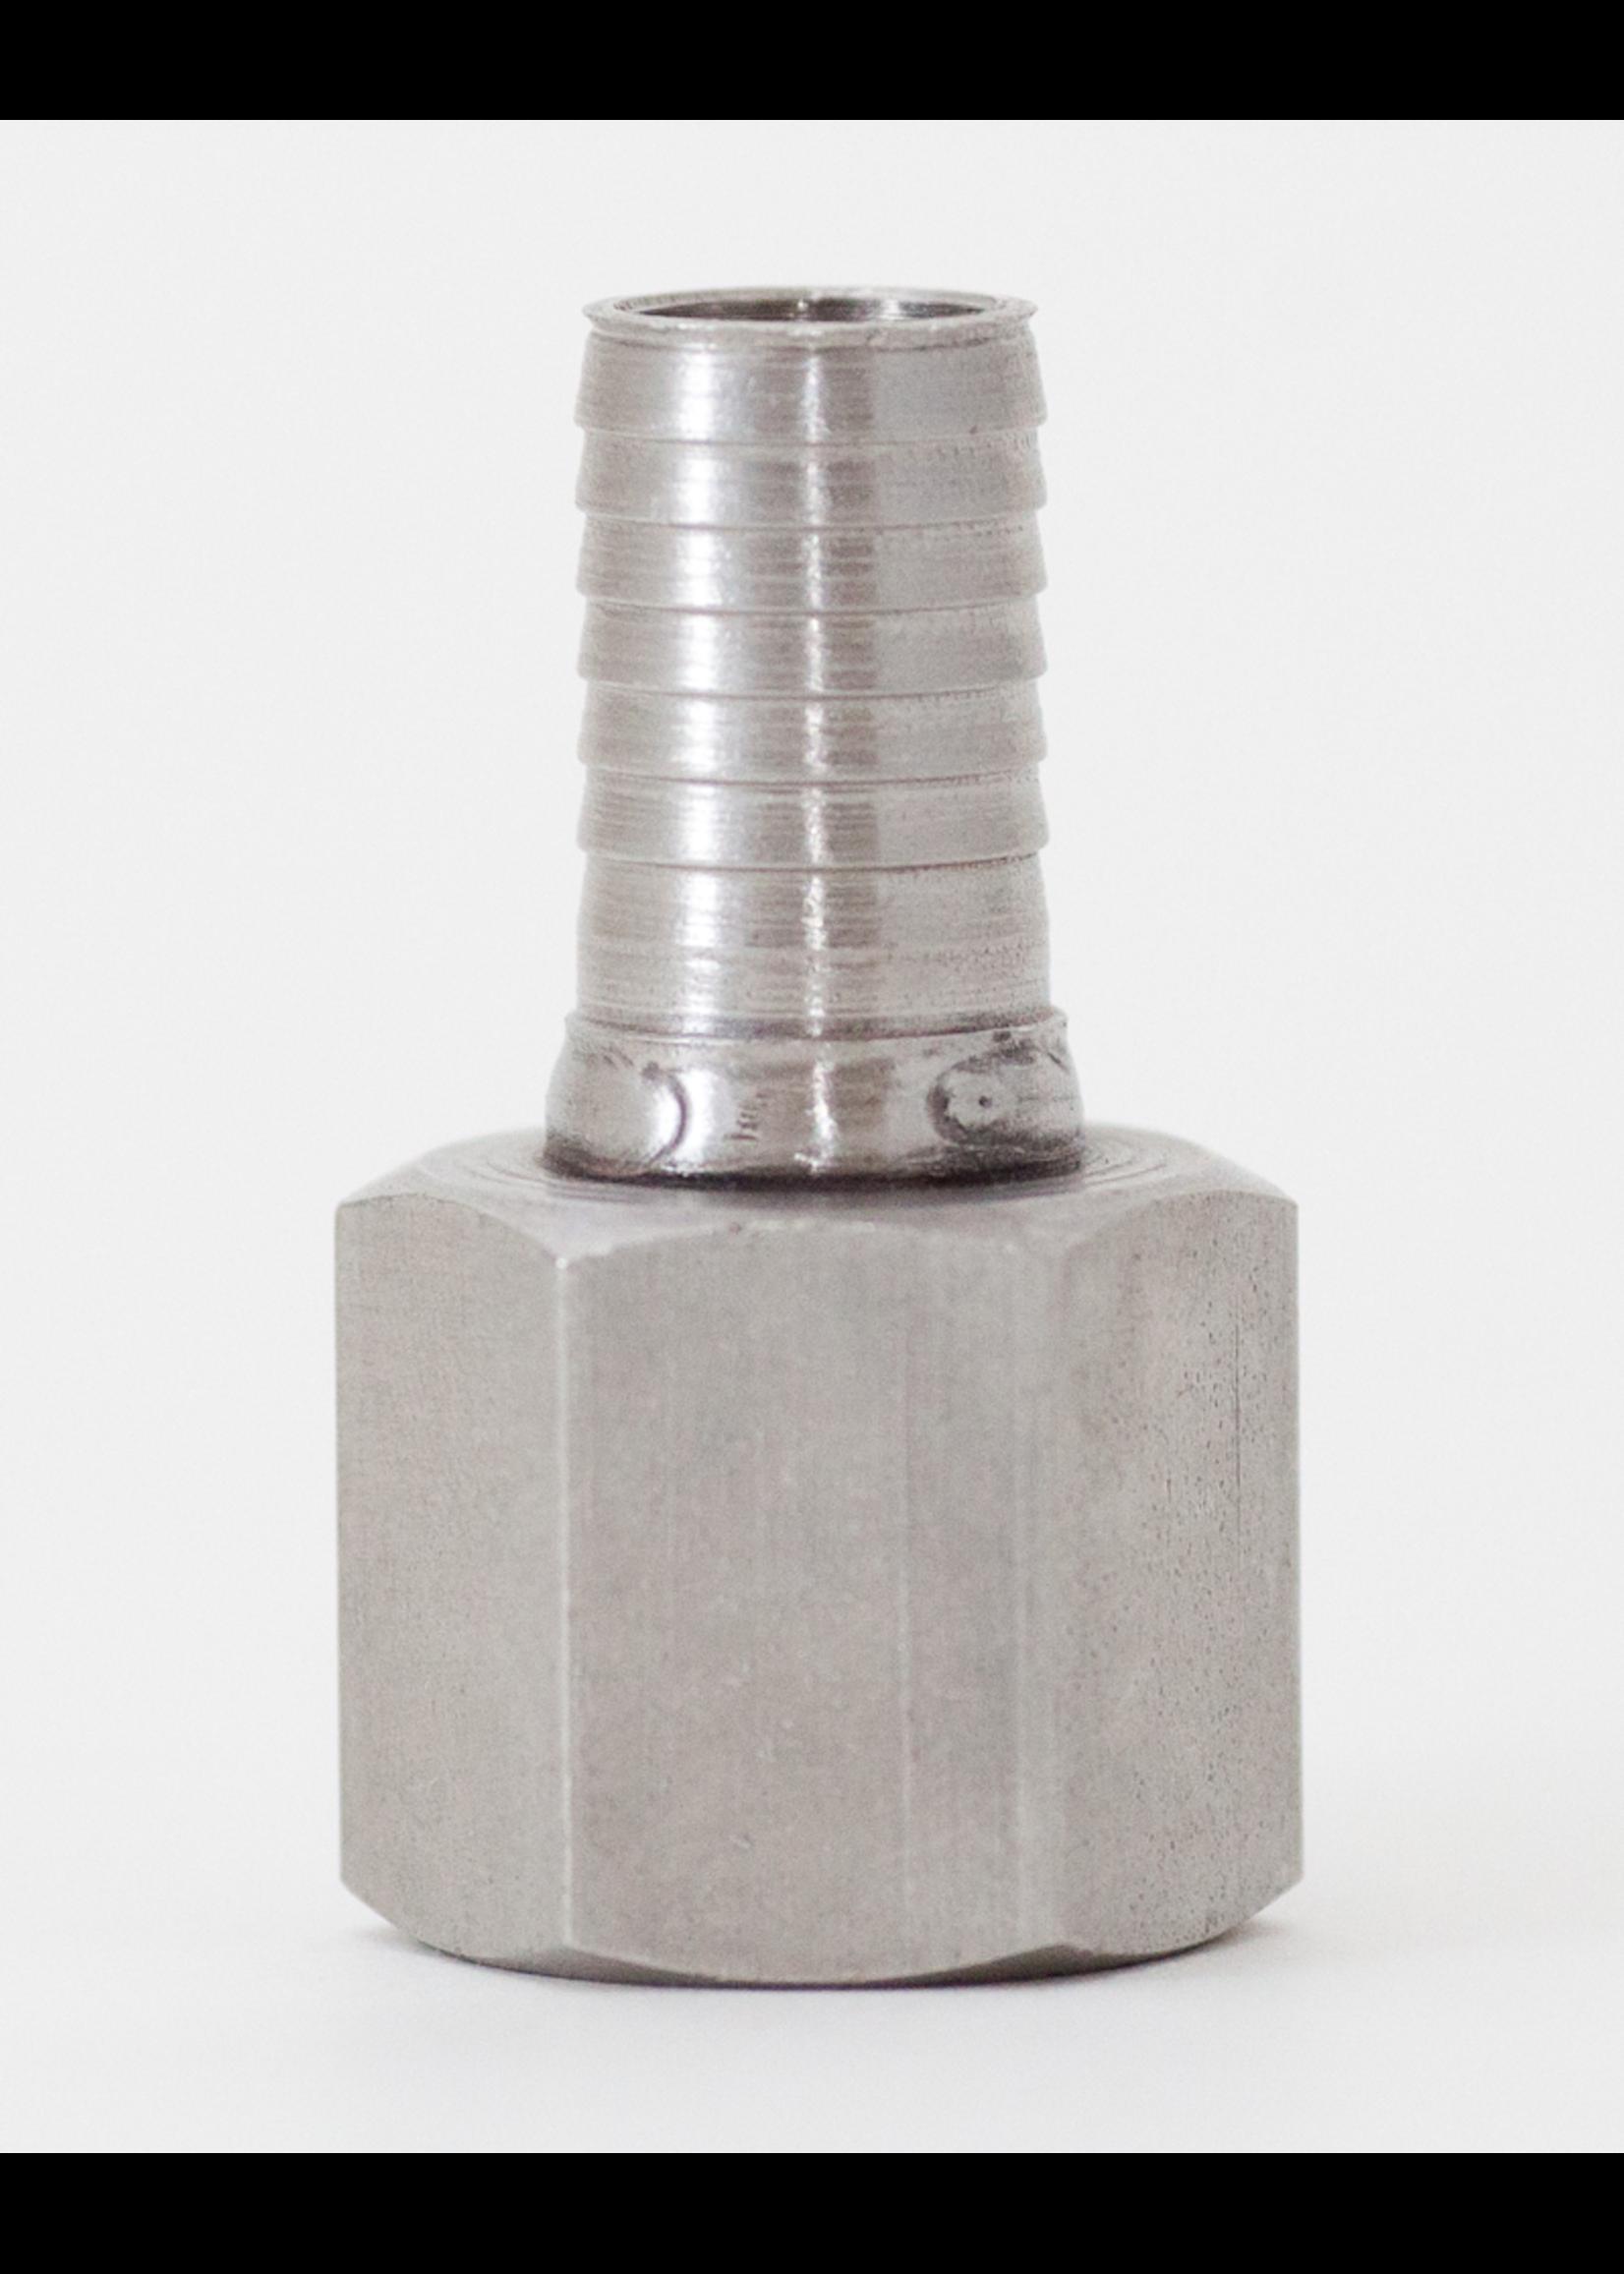 "Kegging Hose Stem - 1/2"" Barb x 1/2"" FPT - Stainless Steel - #C15"